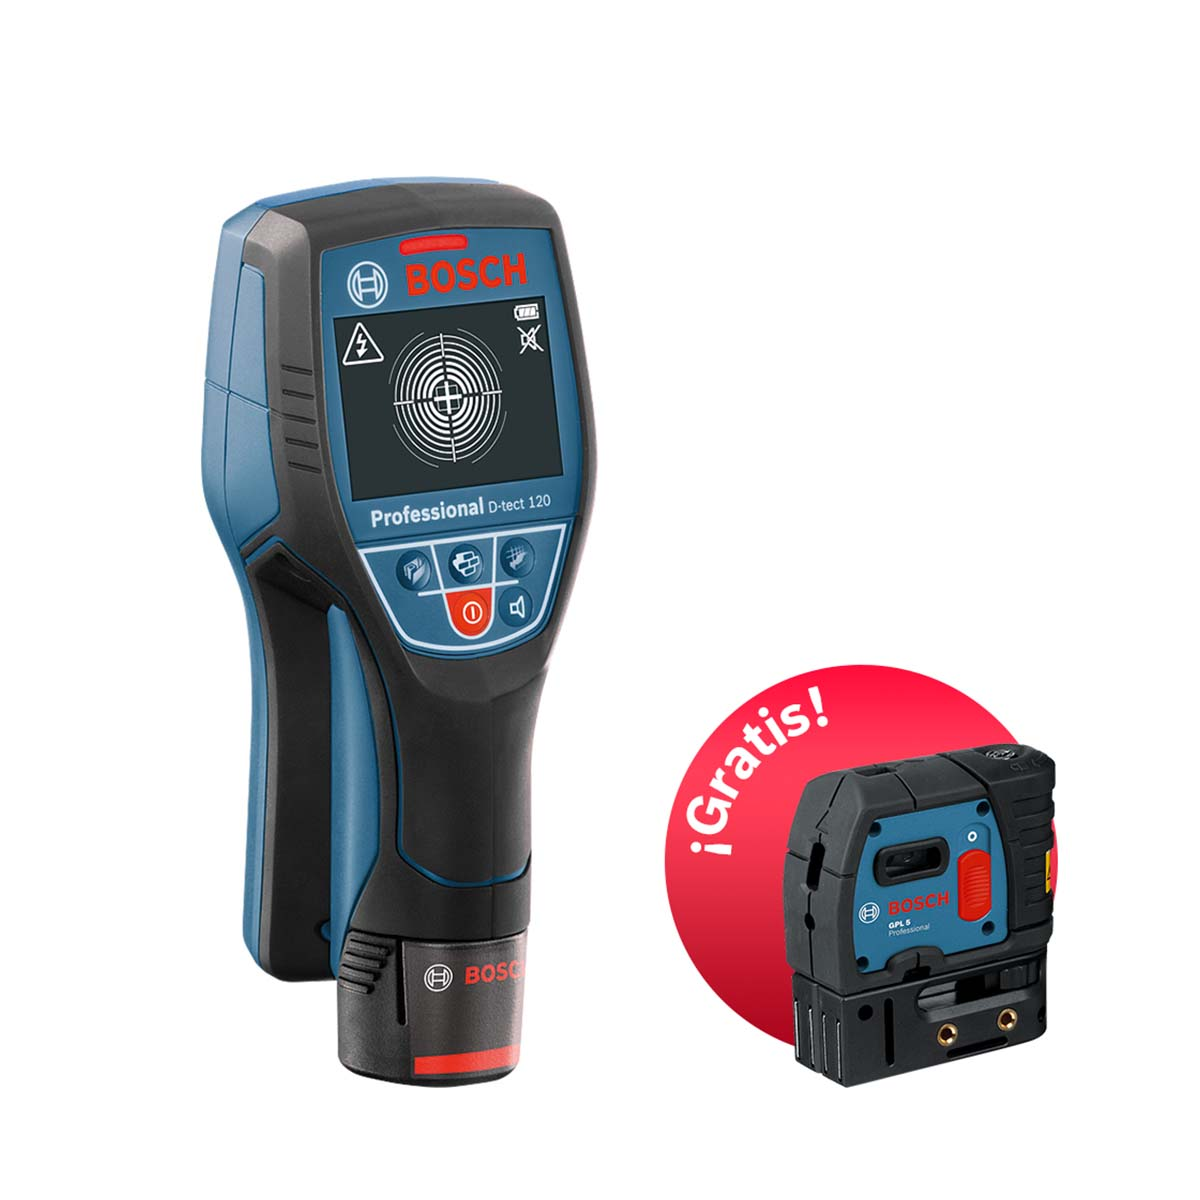 Detector de pared D-tect 120 + Laser de Puntos Gratis Bosch